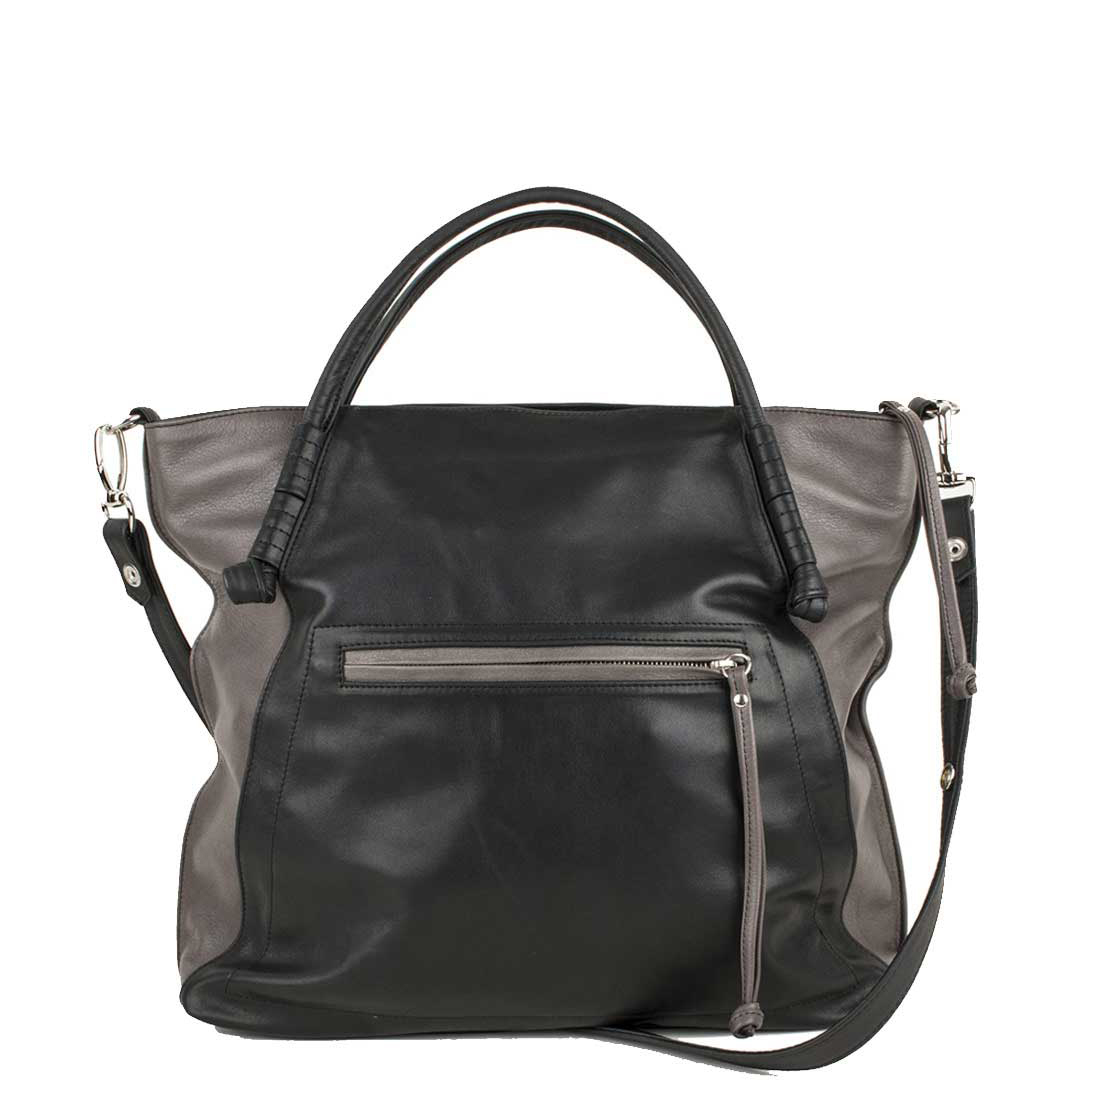 Amber Grigio Black Leather Tote Bag